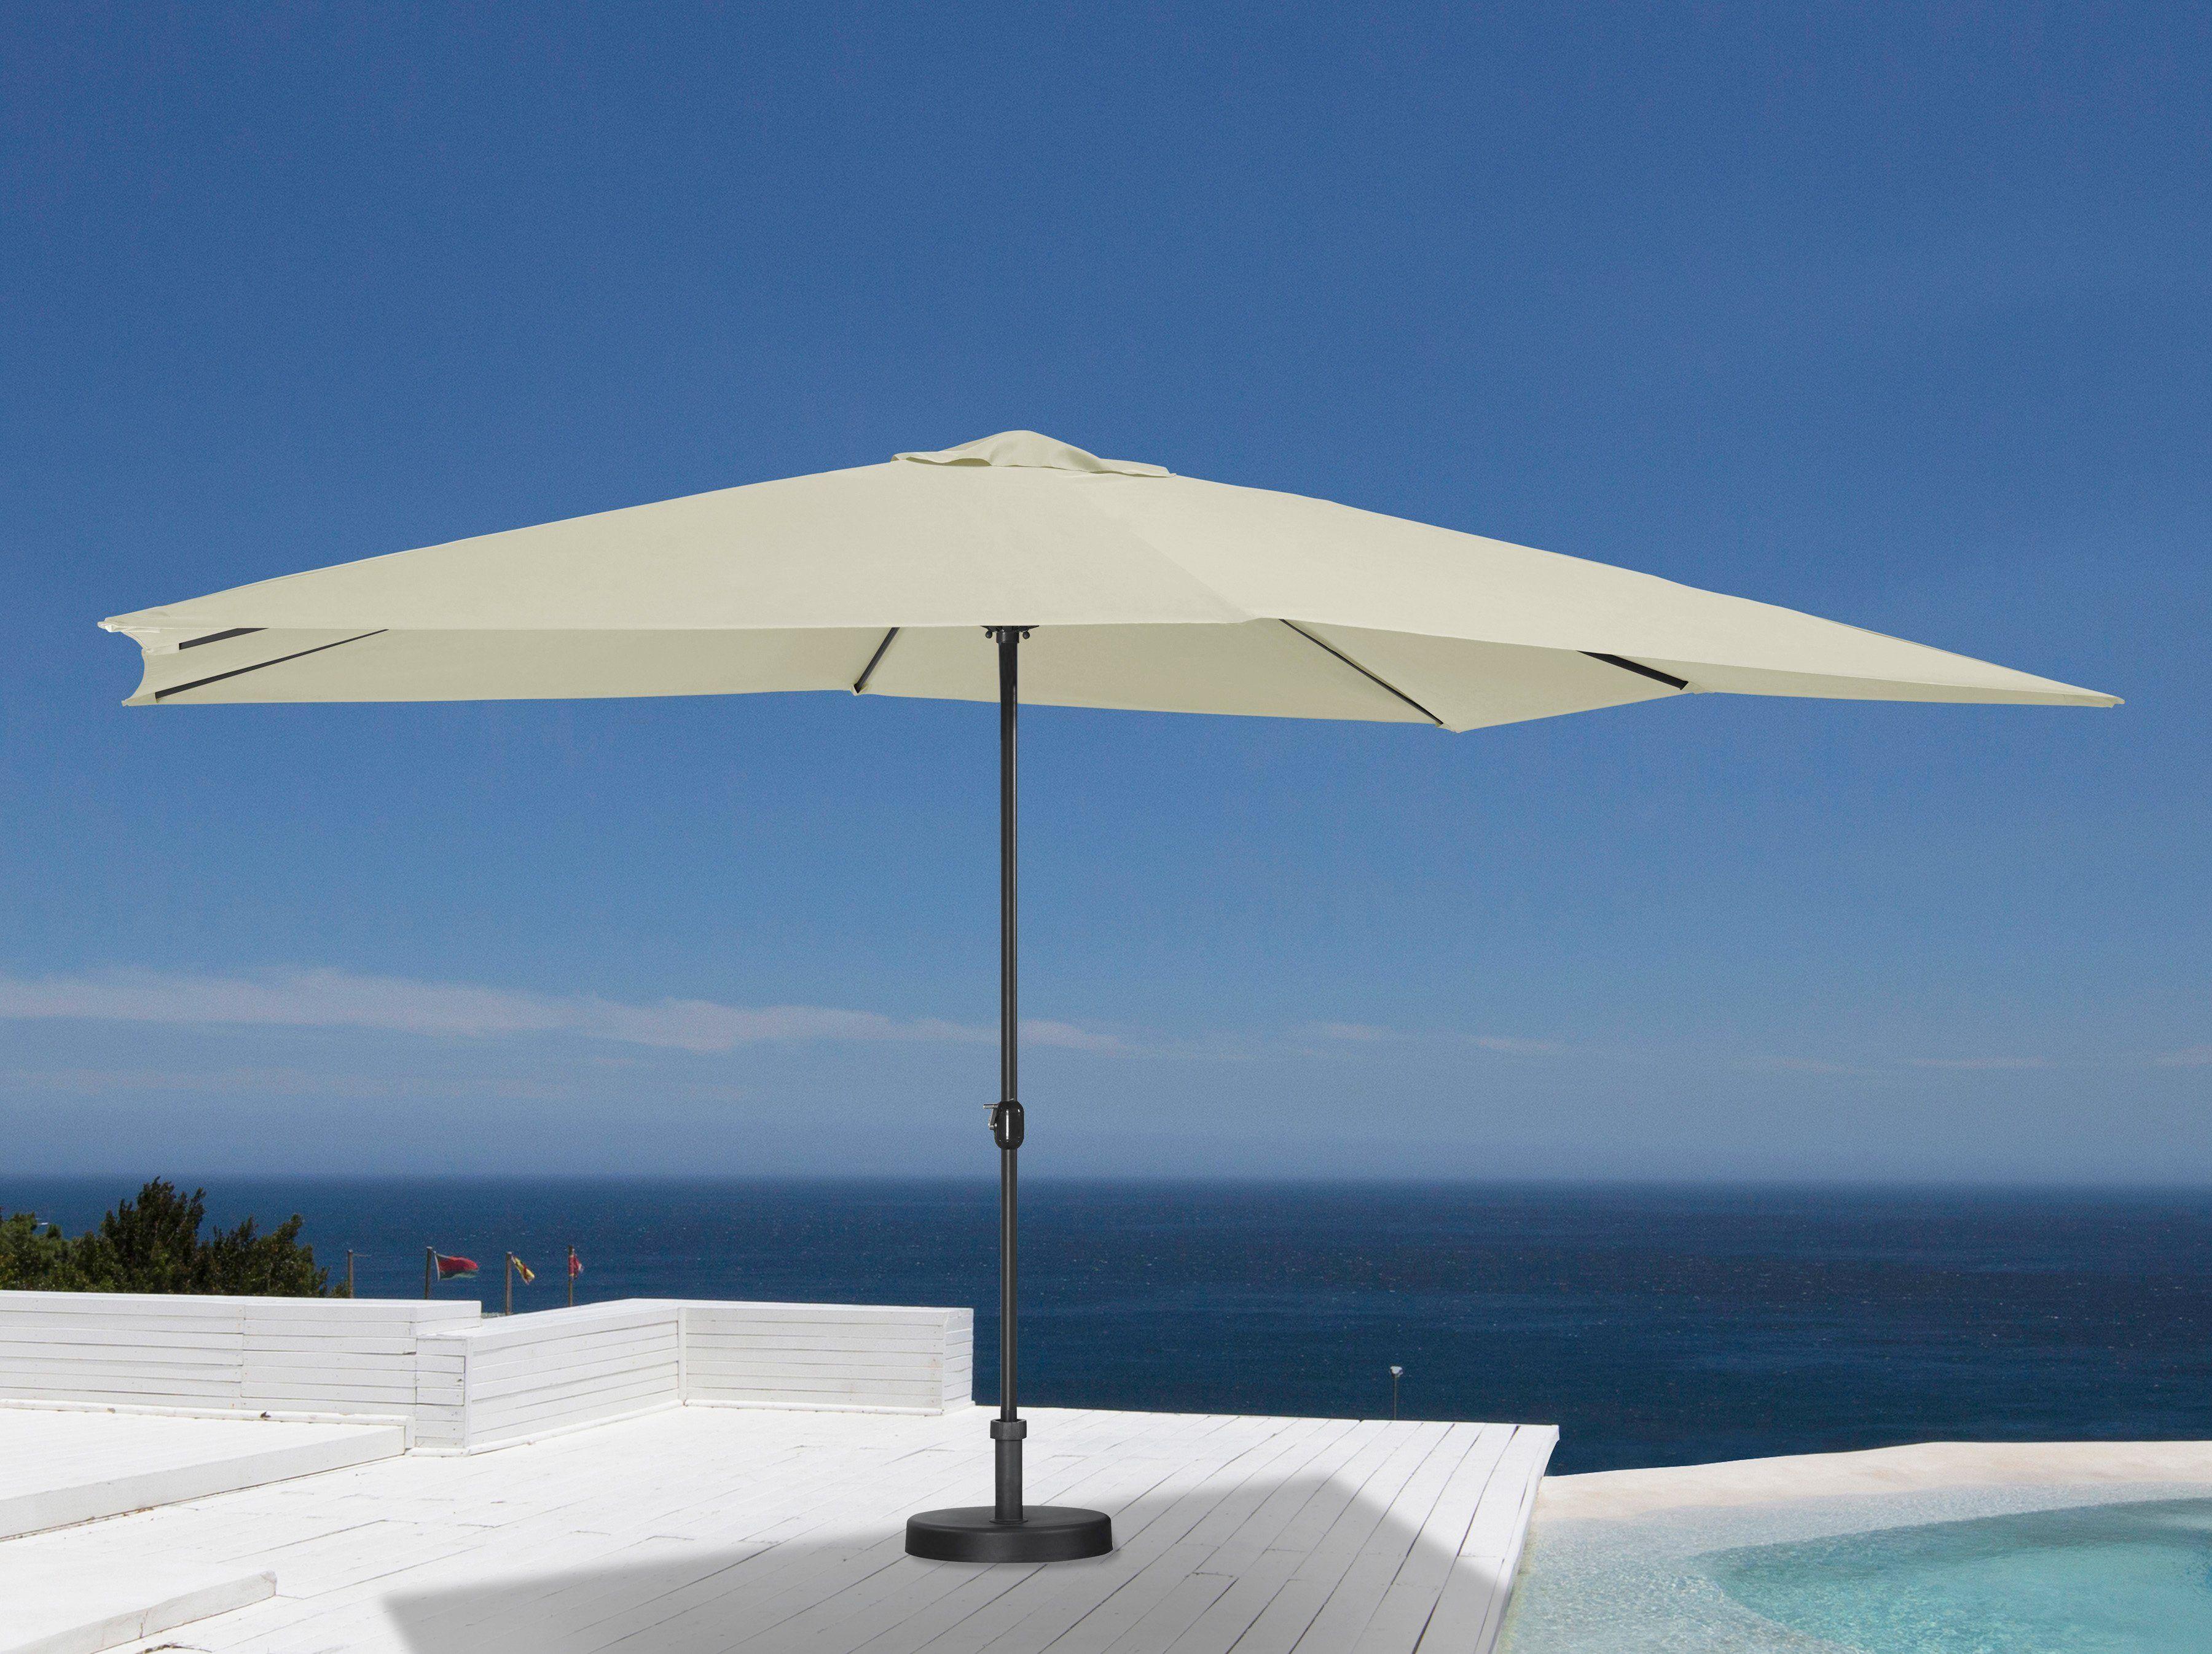 garten gut Sonnenschirm 300x400 cm, cremefarben